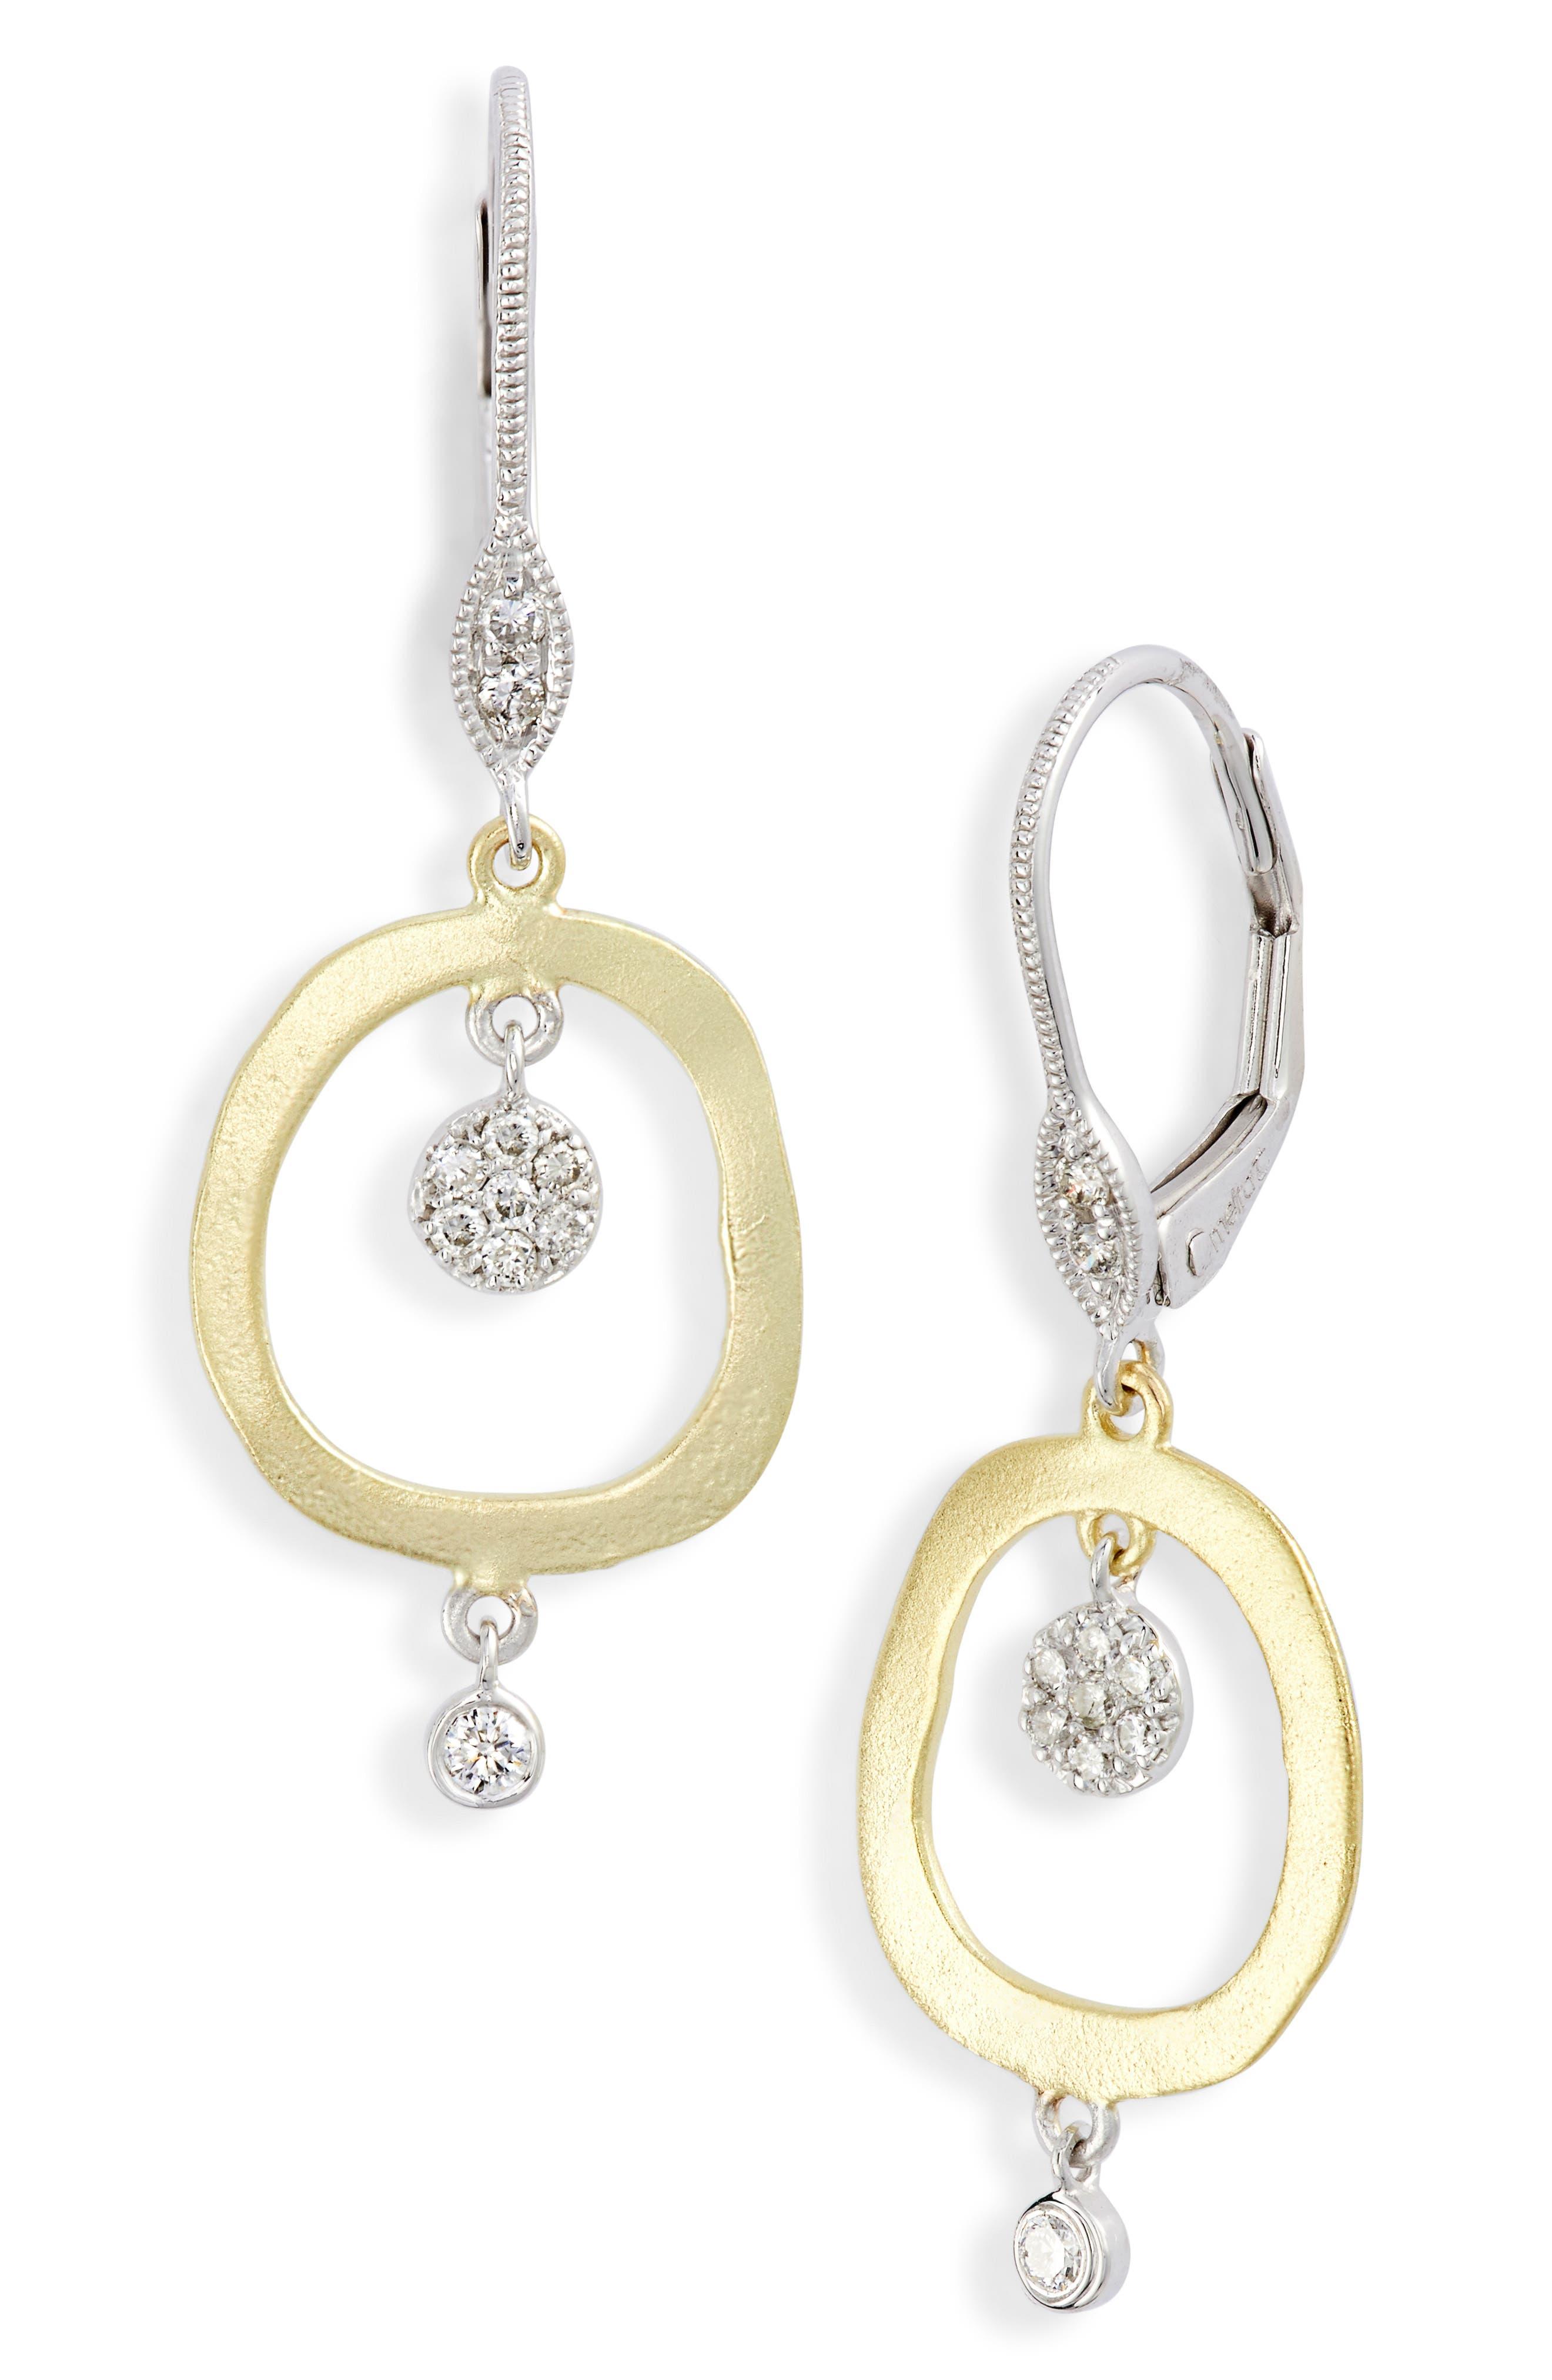 MEIRA T Brushed Gold & Diamond Drop Earrings in Gold/ Diamond